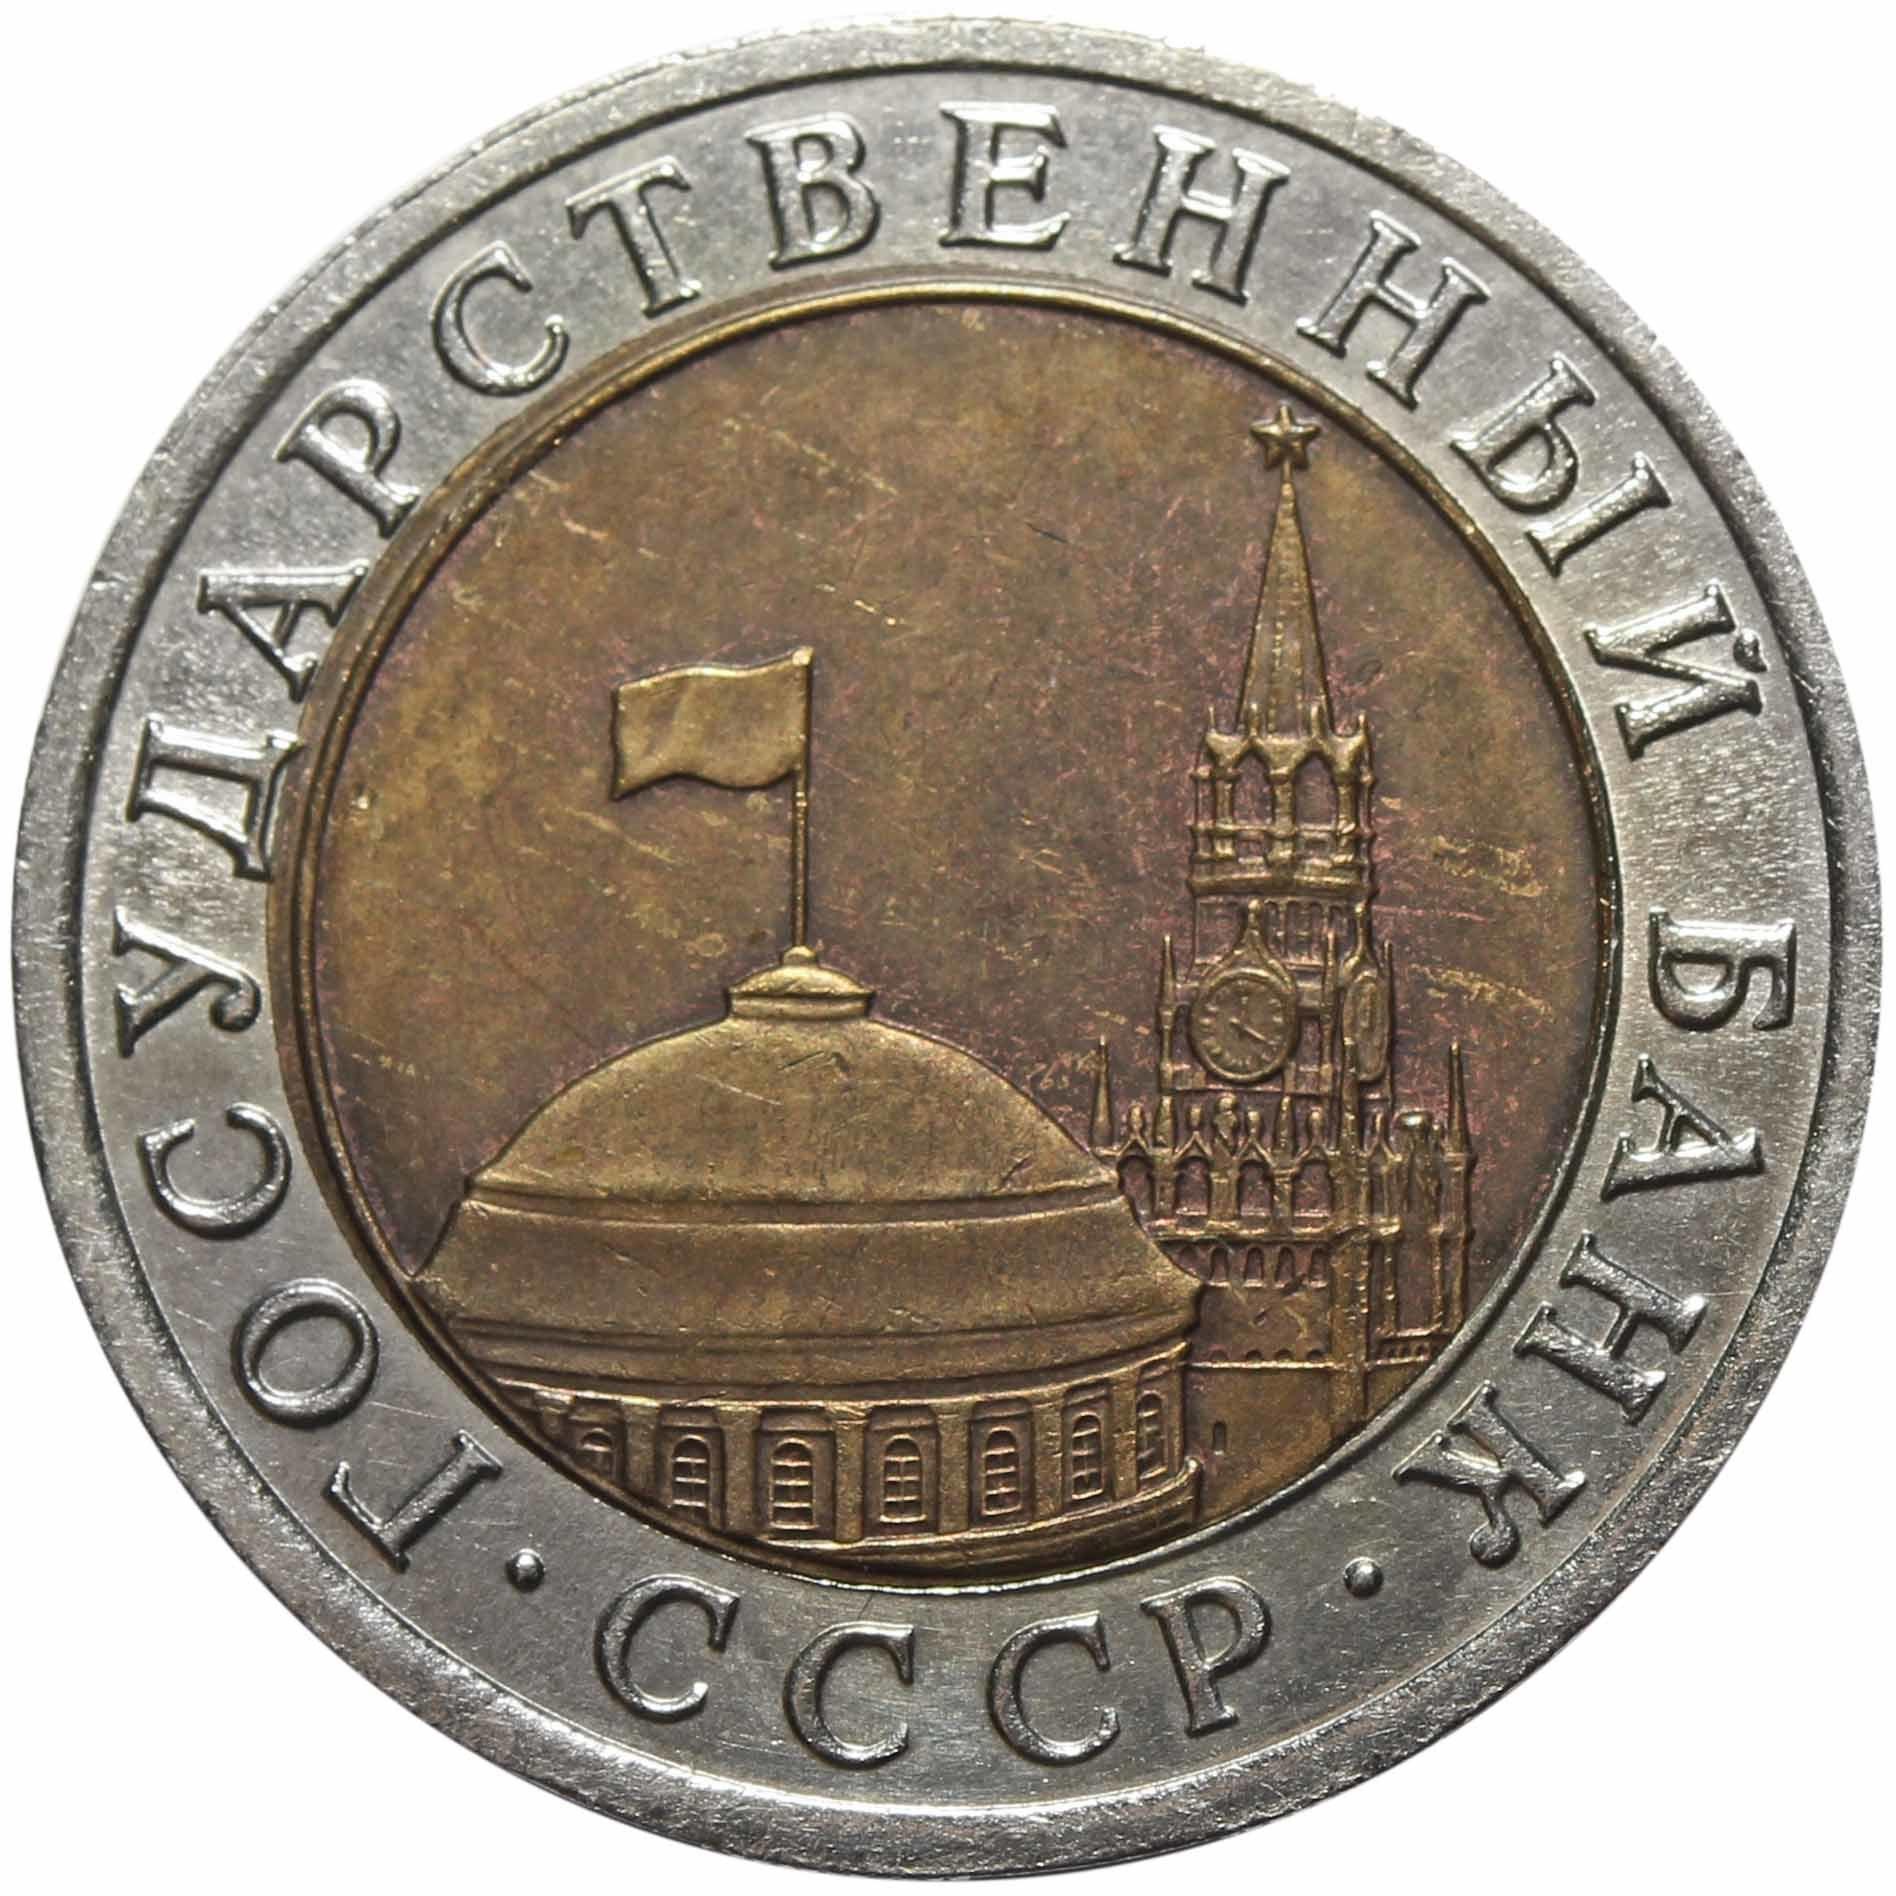 10 рублей 1992 год ЛМД (биметалл) XF+